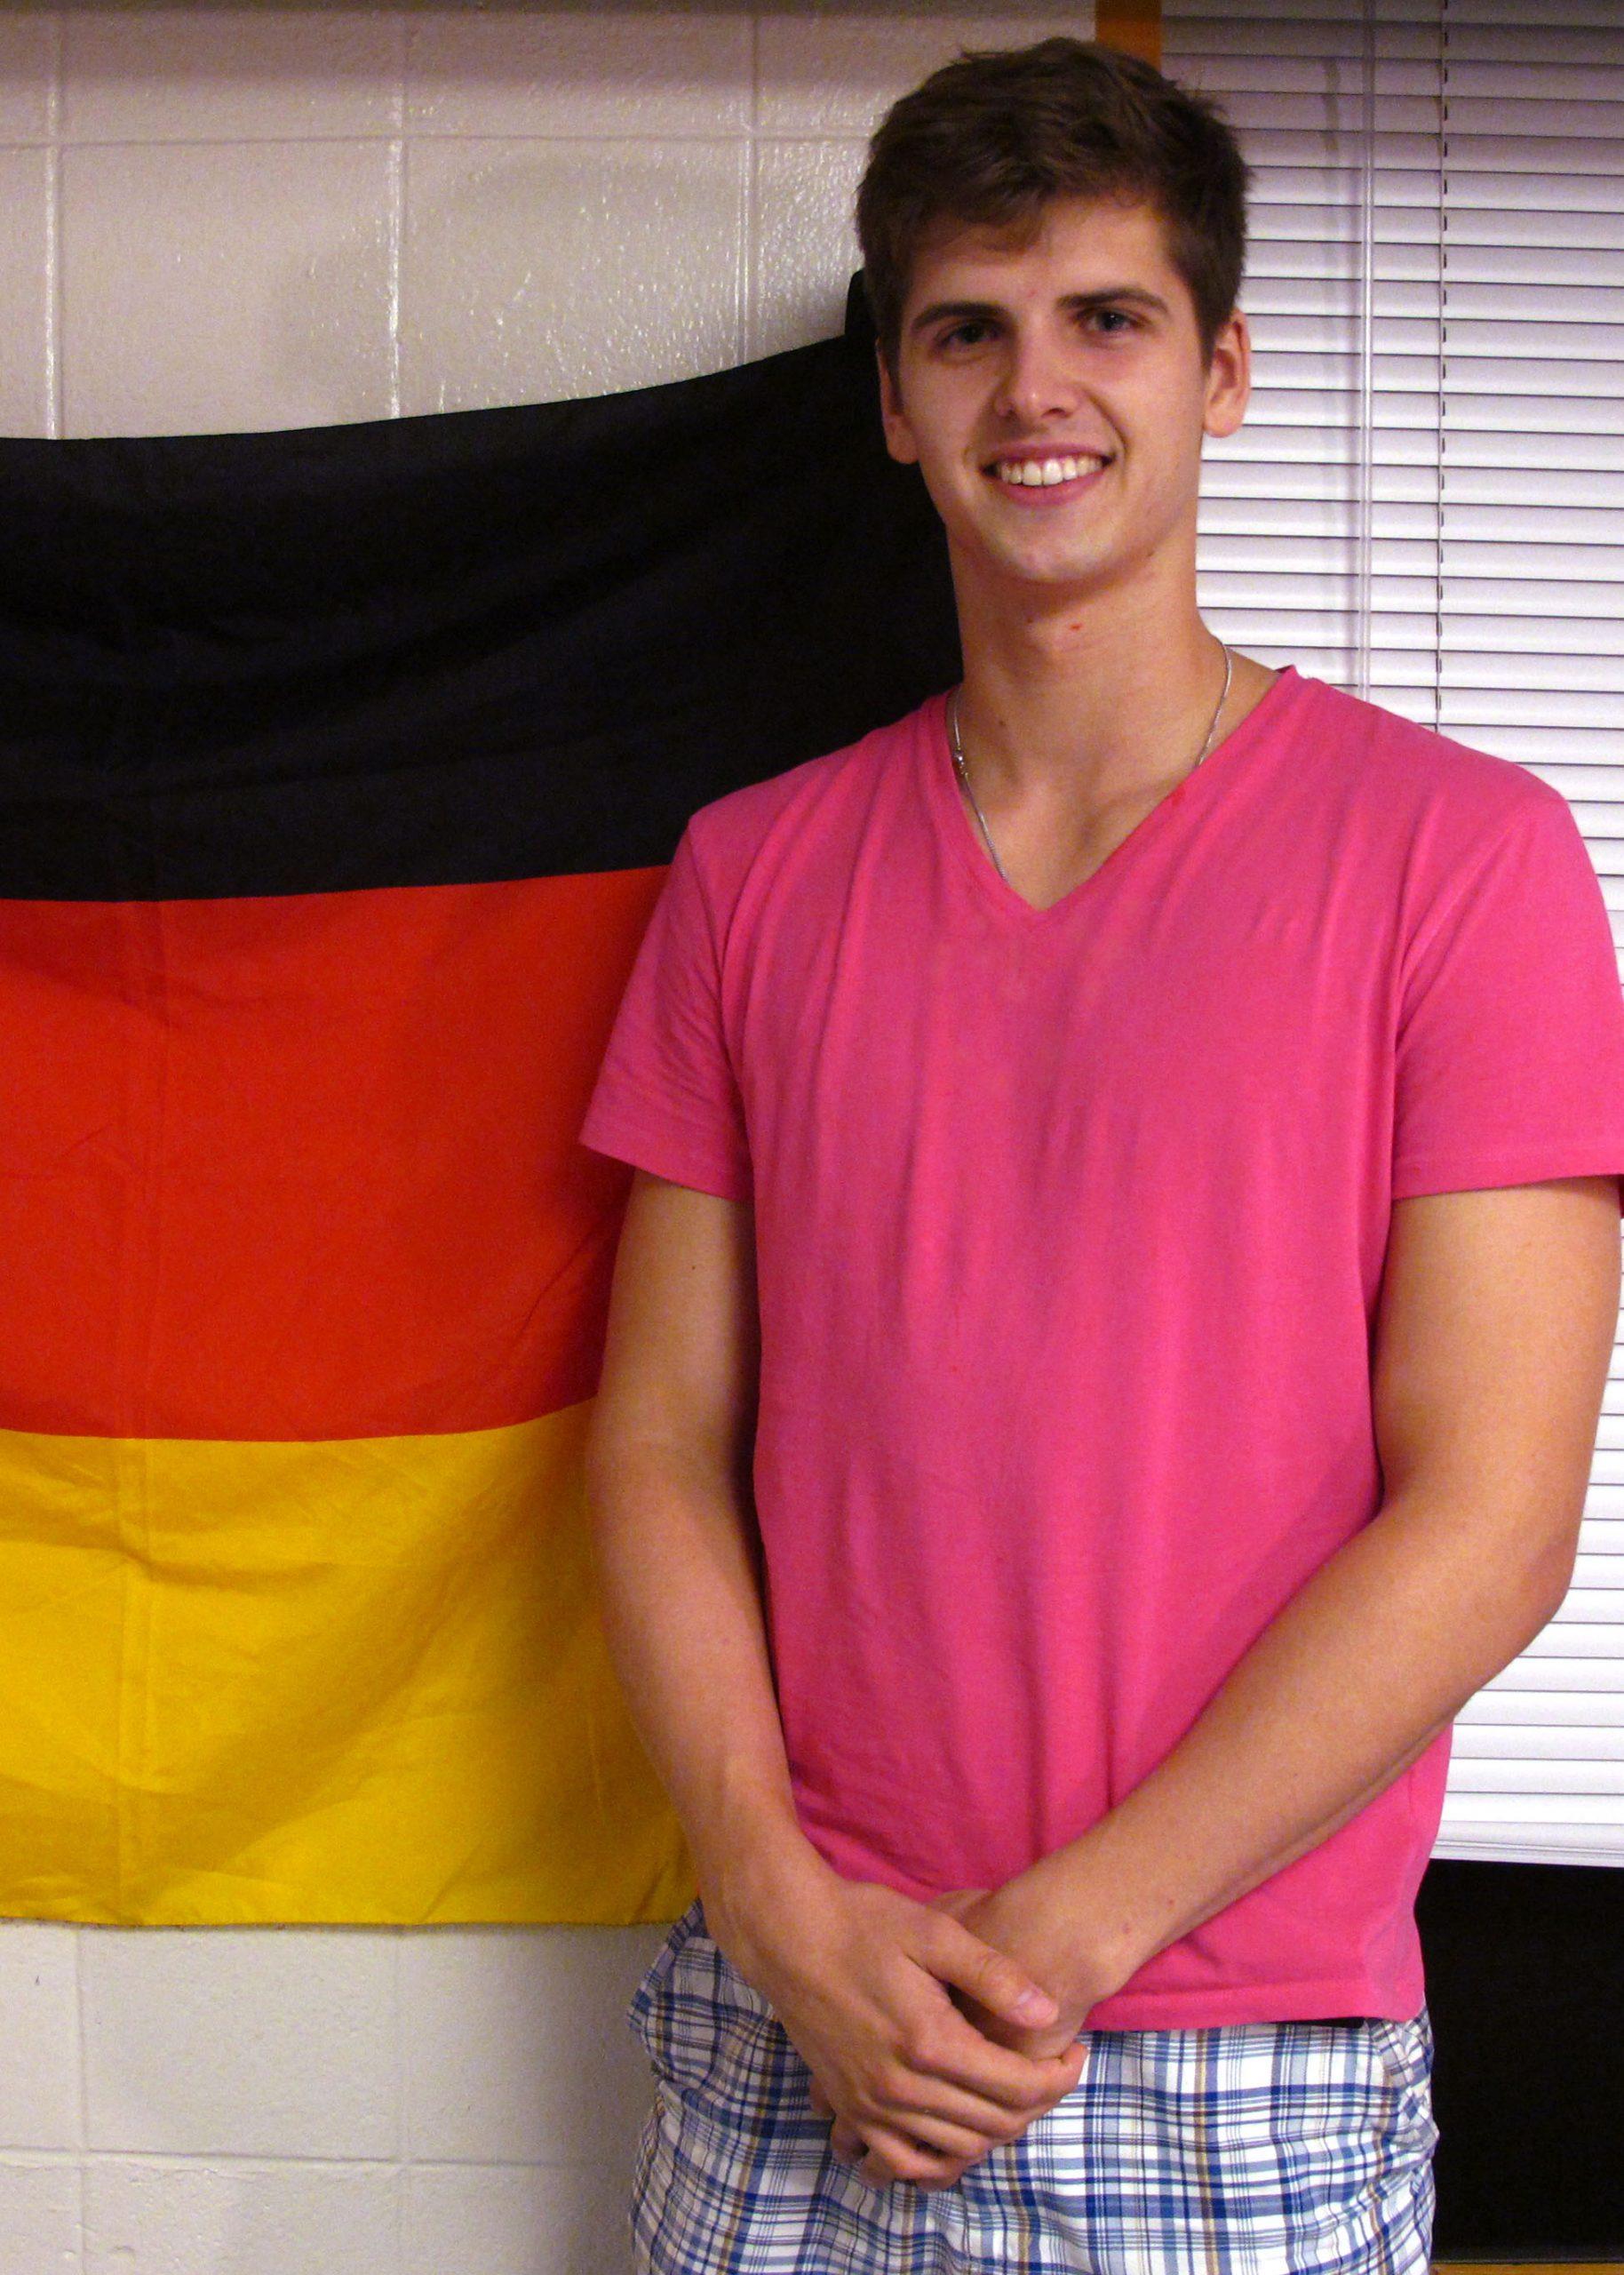 Jan Zawadzki stands next to a German flag in his dorm room